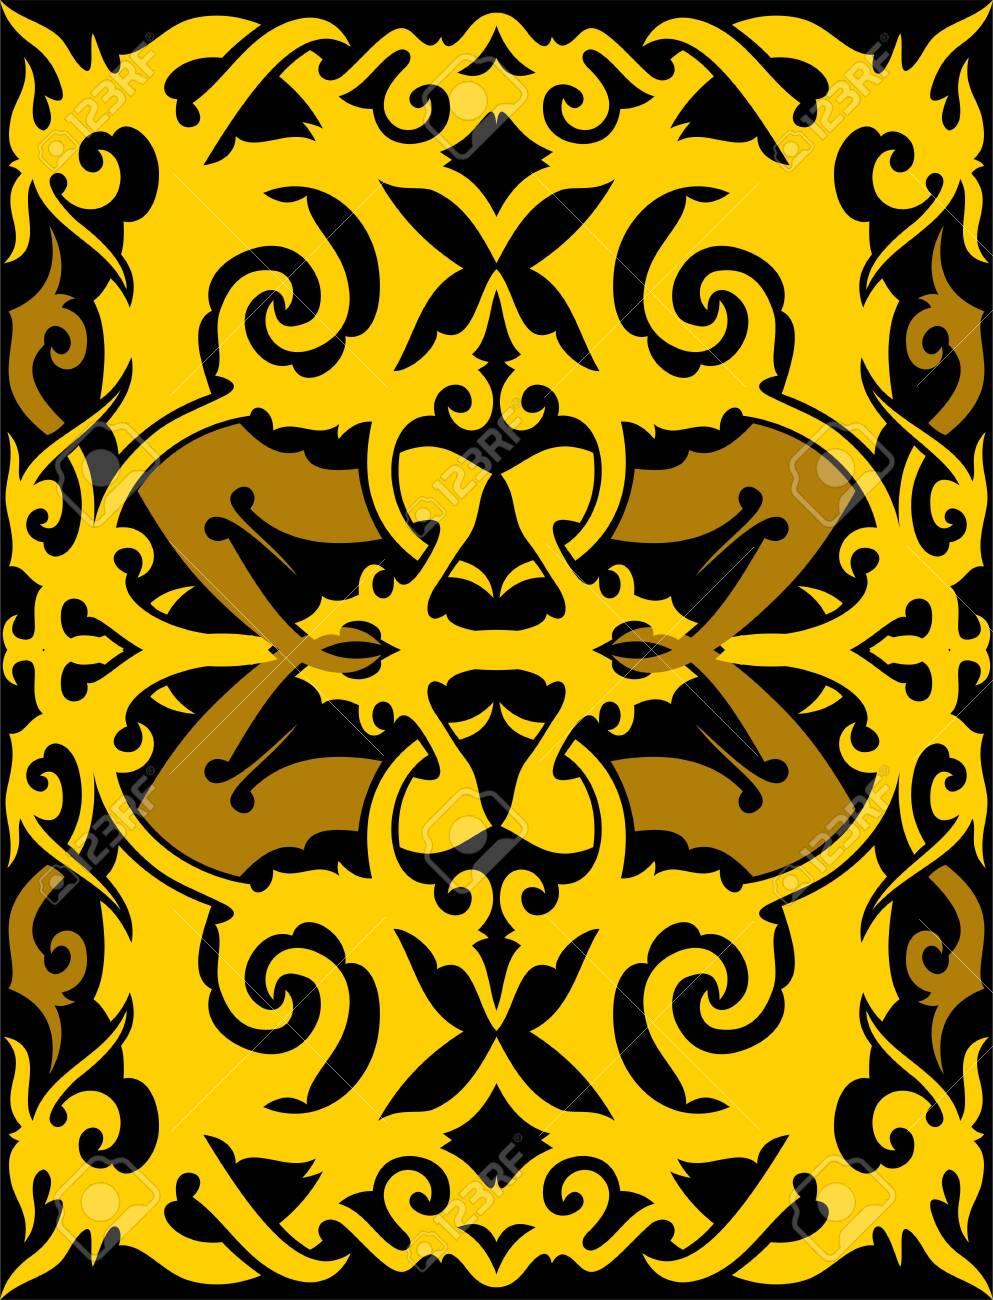 Background Motif Dayak : background, motif, dayak, Seamless, Pattern, Borneo, Batik, Style., Traditional, Indonesian.., Royalty, Cliparts,, Vectors,, Stock, Illustration., Image, 127849413.